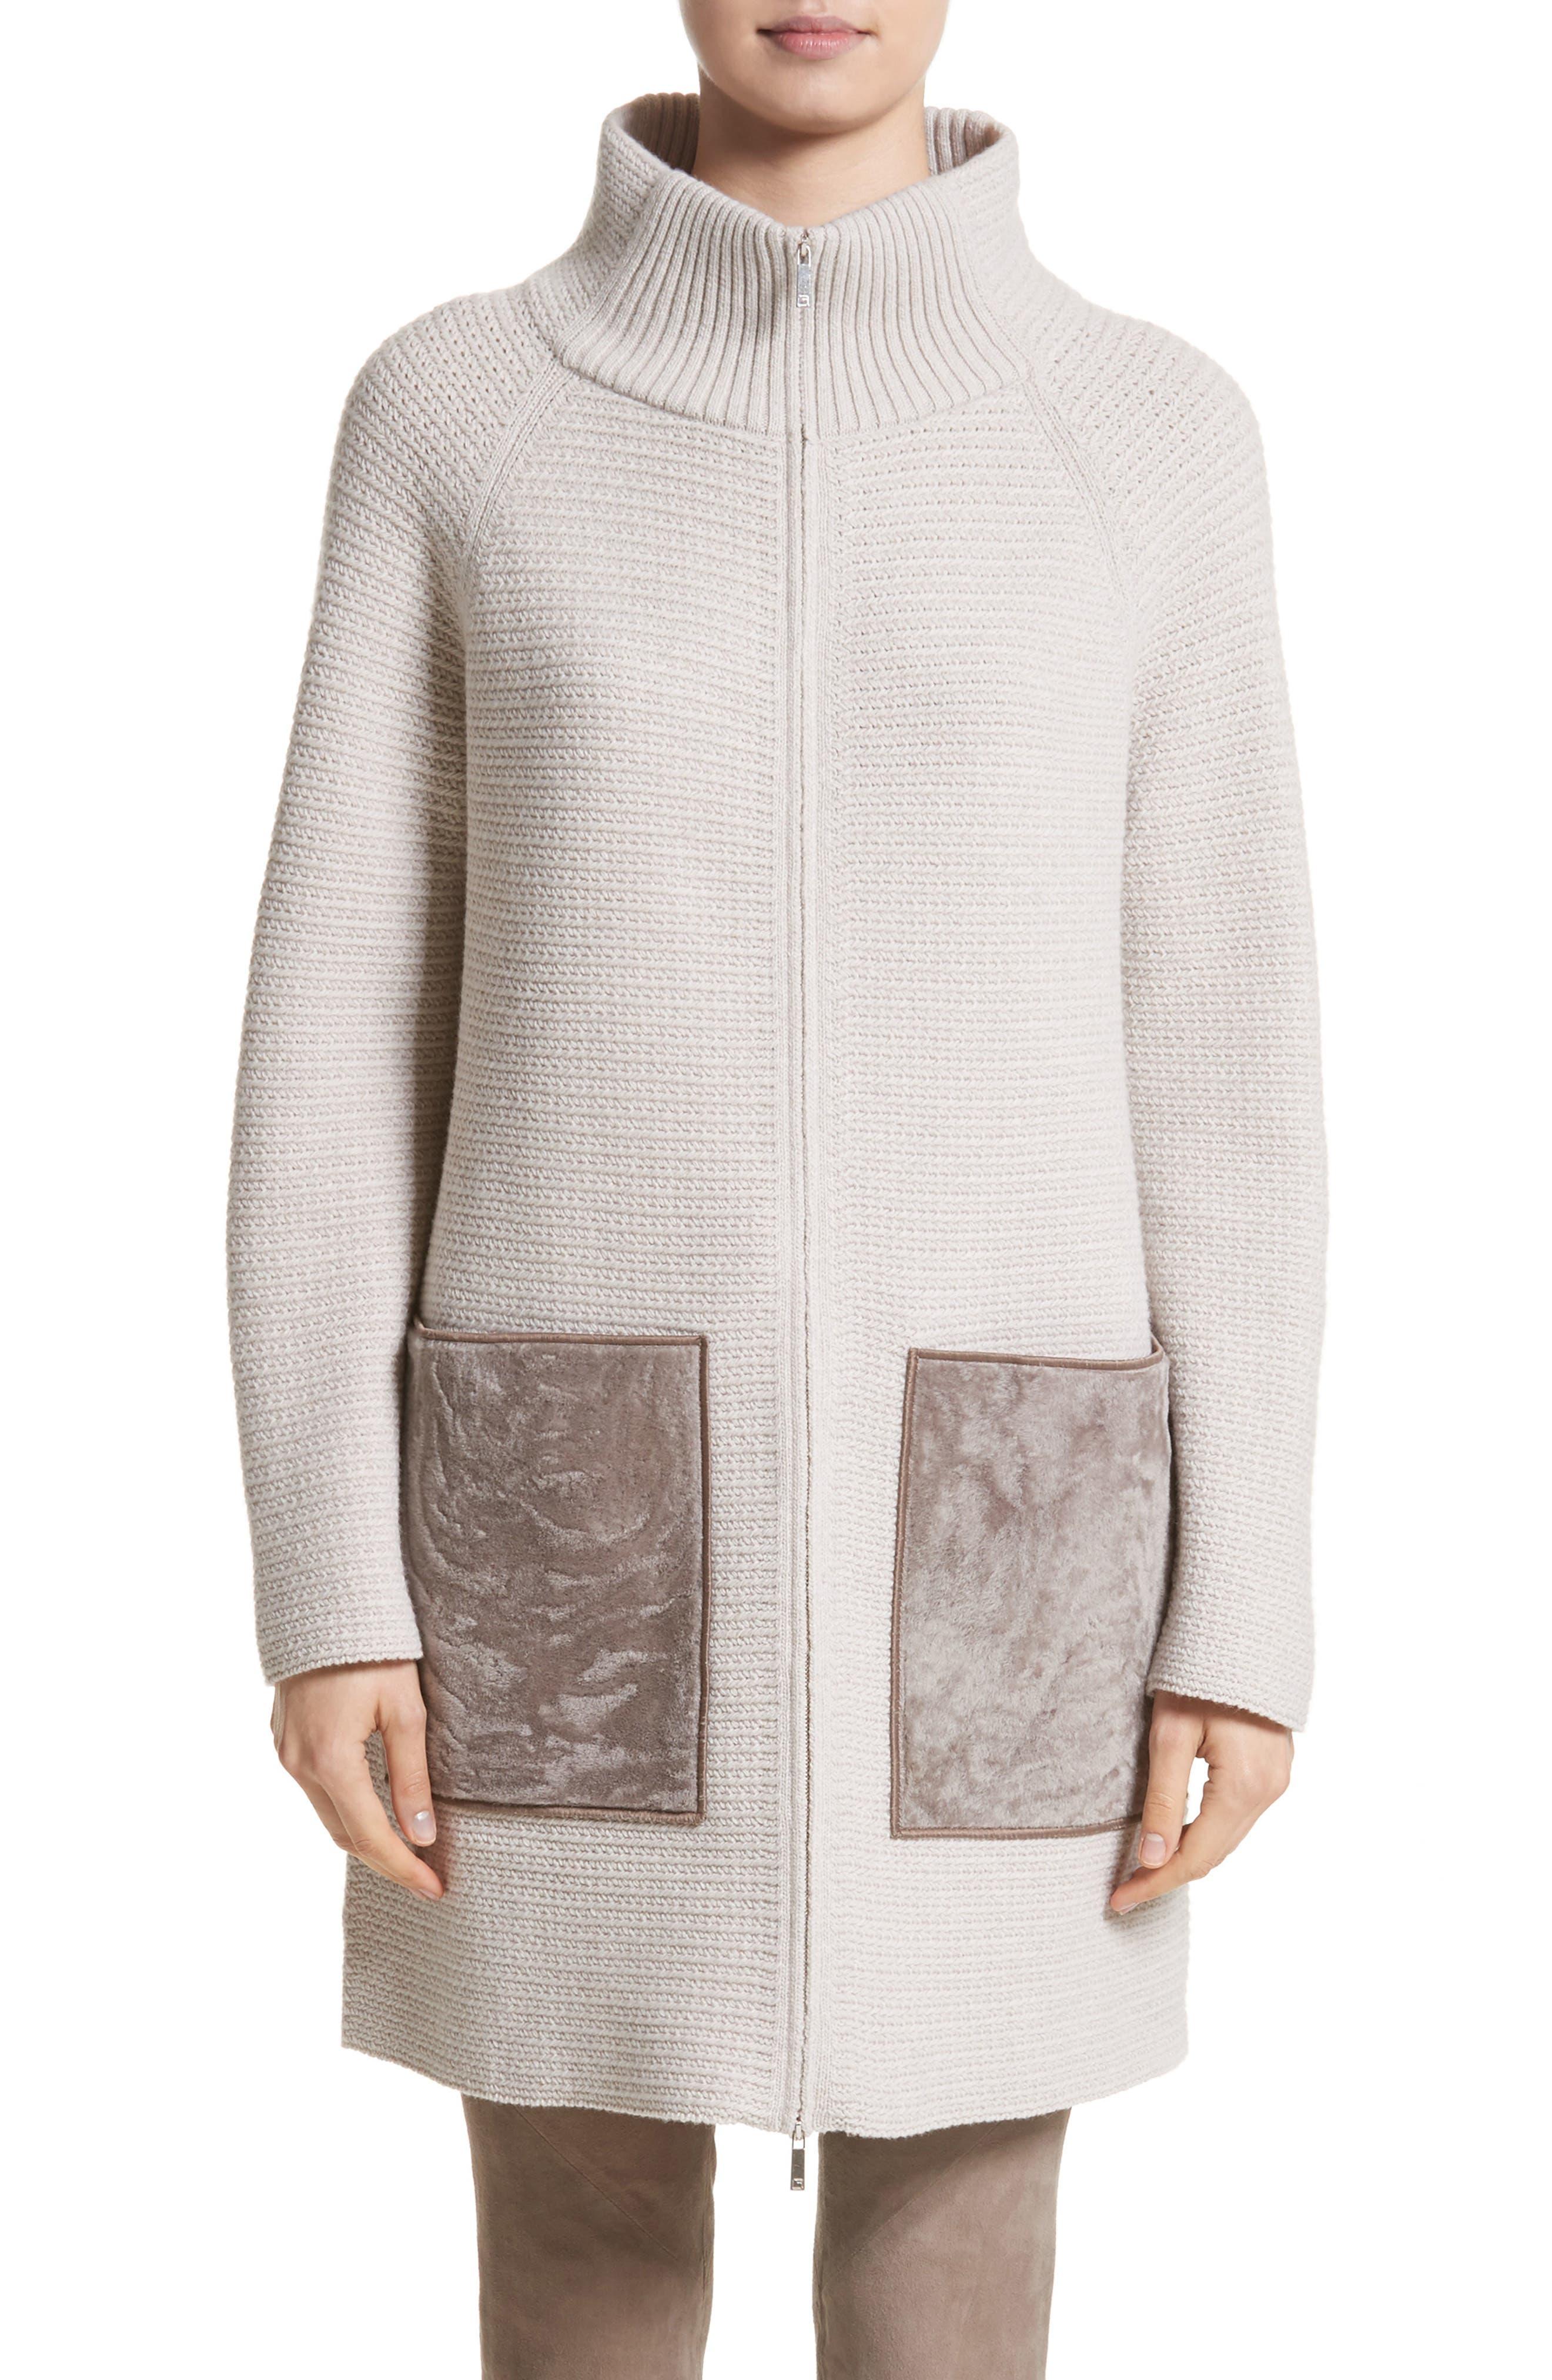 Wool & Cashmere Herringbone Stitch Cardigan with Genuine Shearling Pockets,                         Main,                         color, Ecru Melange